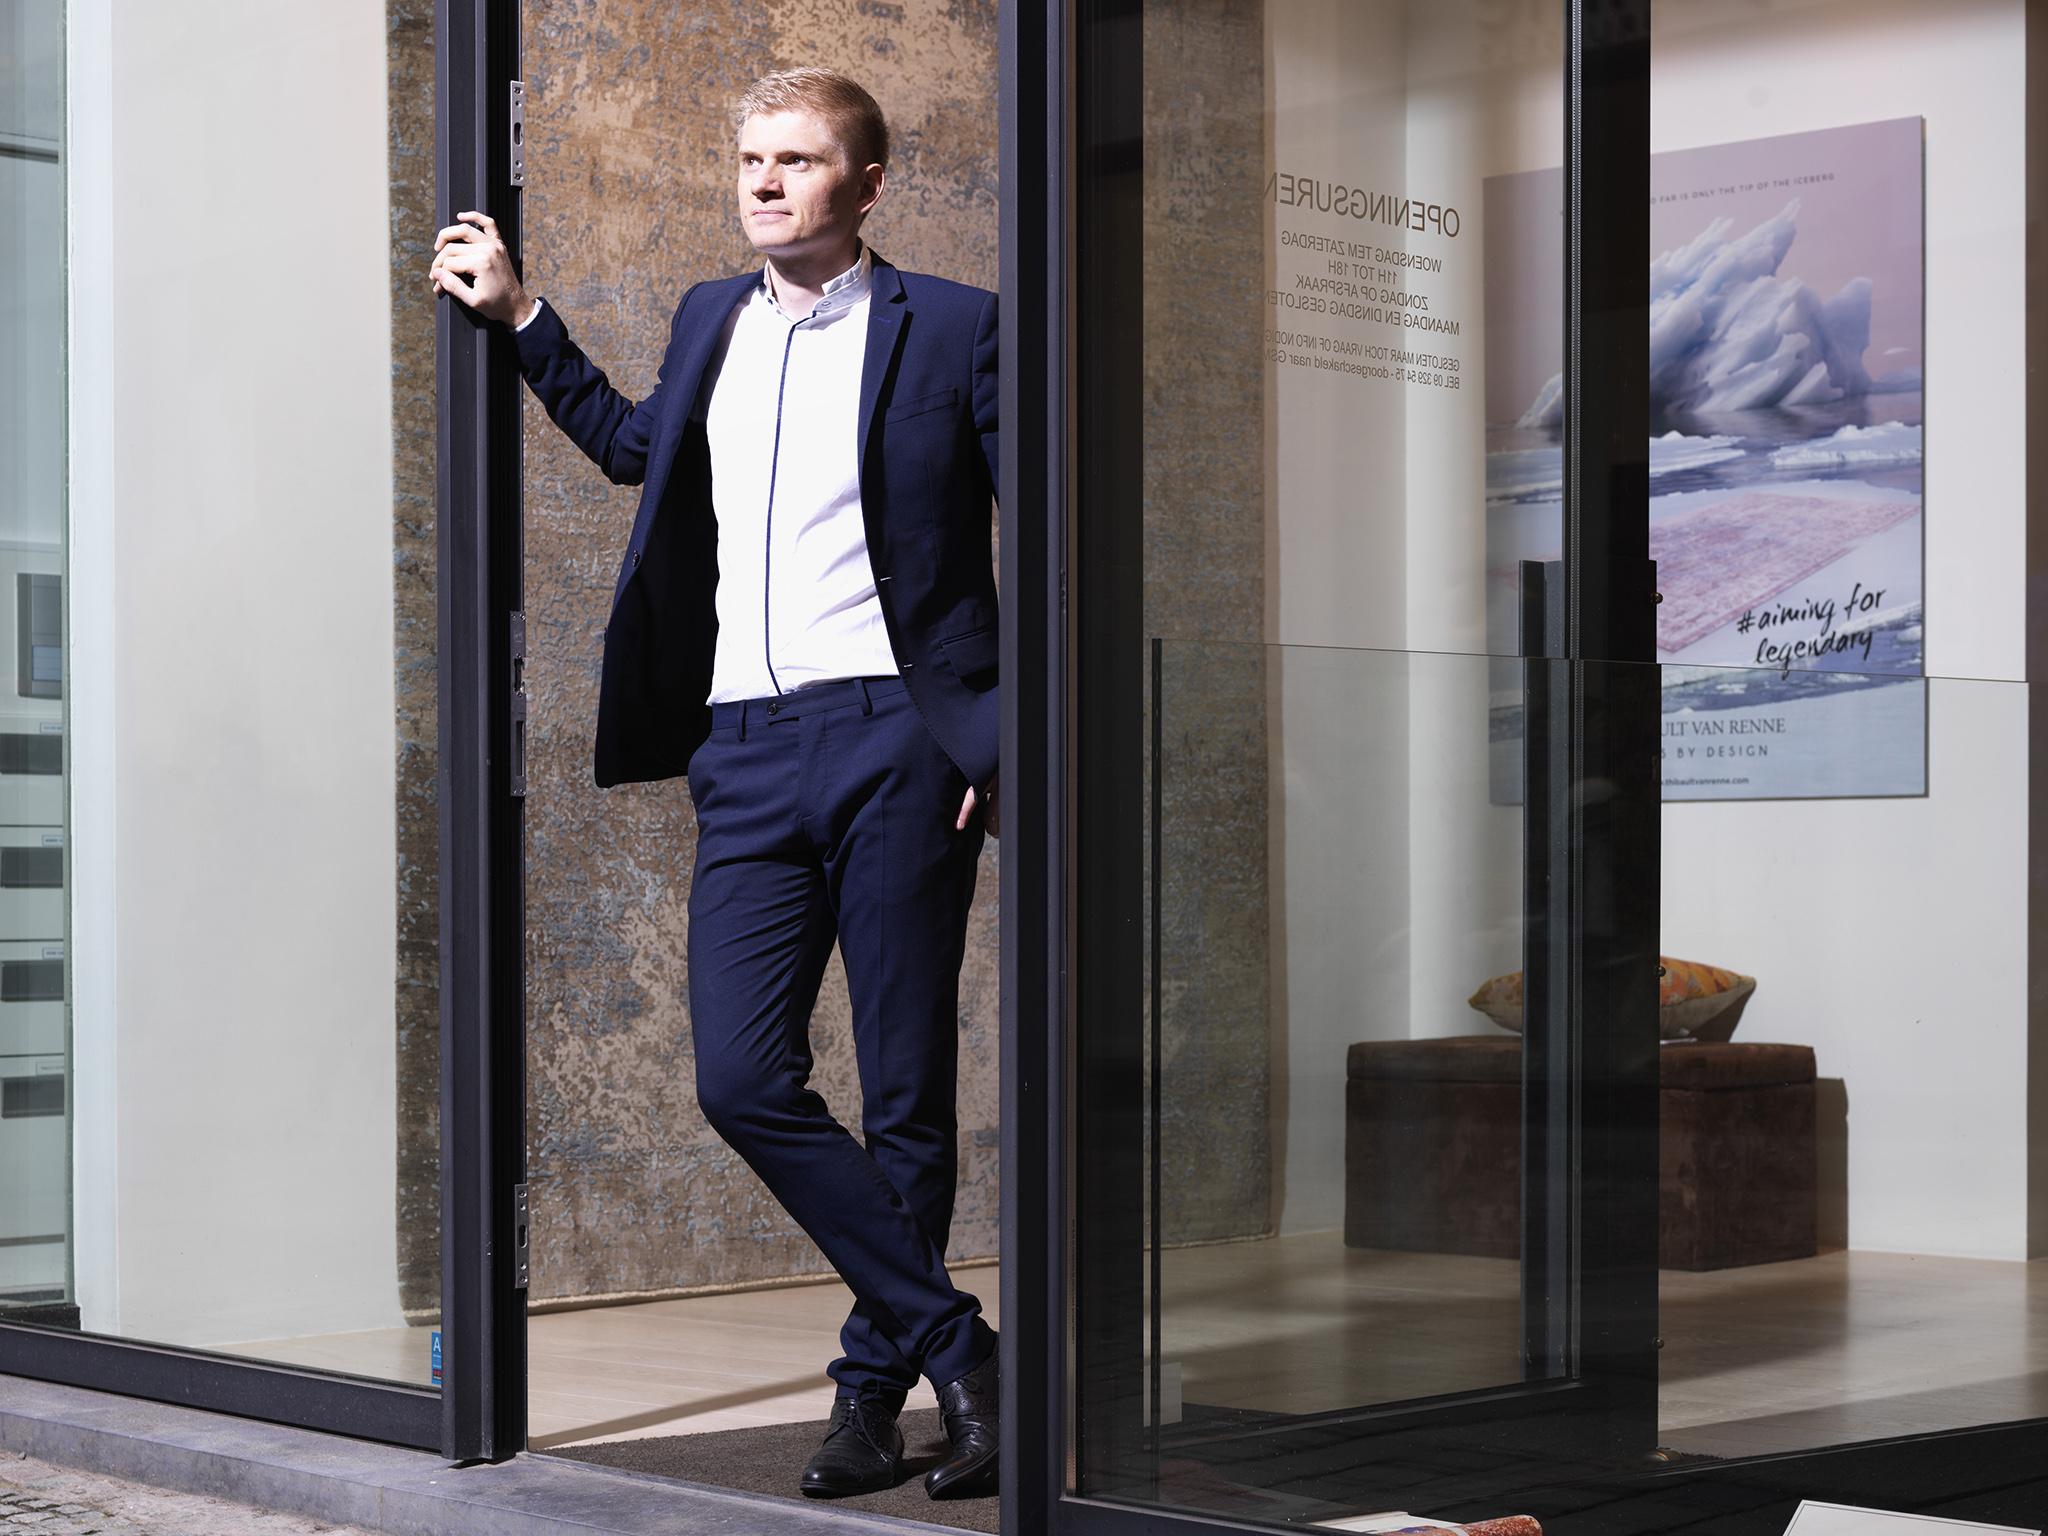 Thibault Van Renne shown at his recently expanded (flagship) showroom in Gent, Belgium. | Image courtesy of Thibault Van Renne.